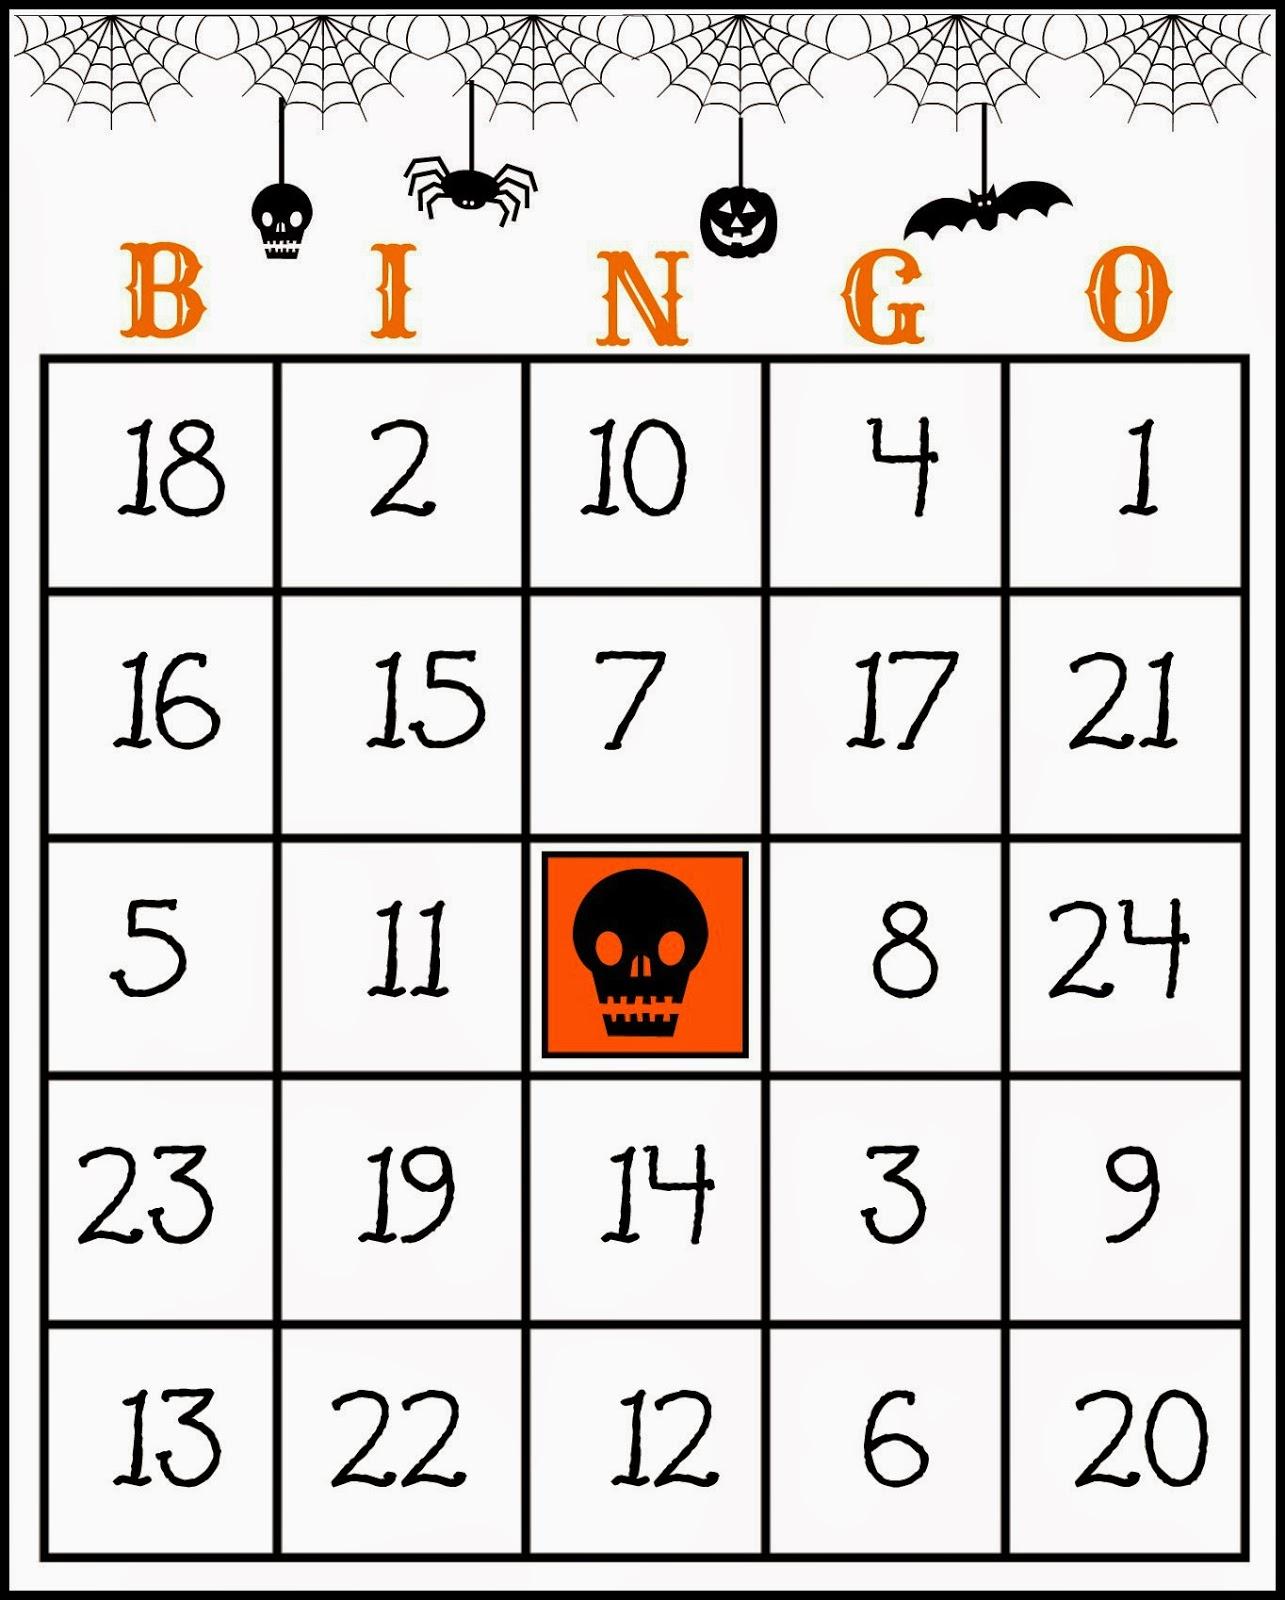 Free Printable Halloween Bingo Cards With Pictures.Crafty In Crosby Free Printable Halloween Bingo Game